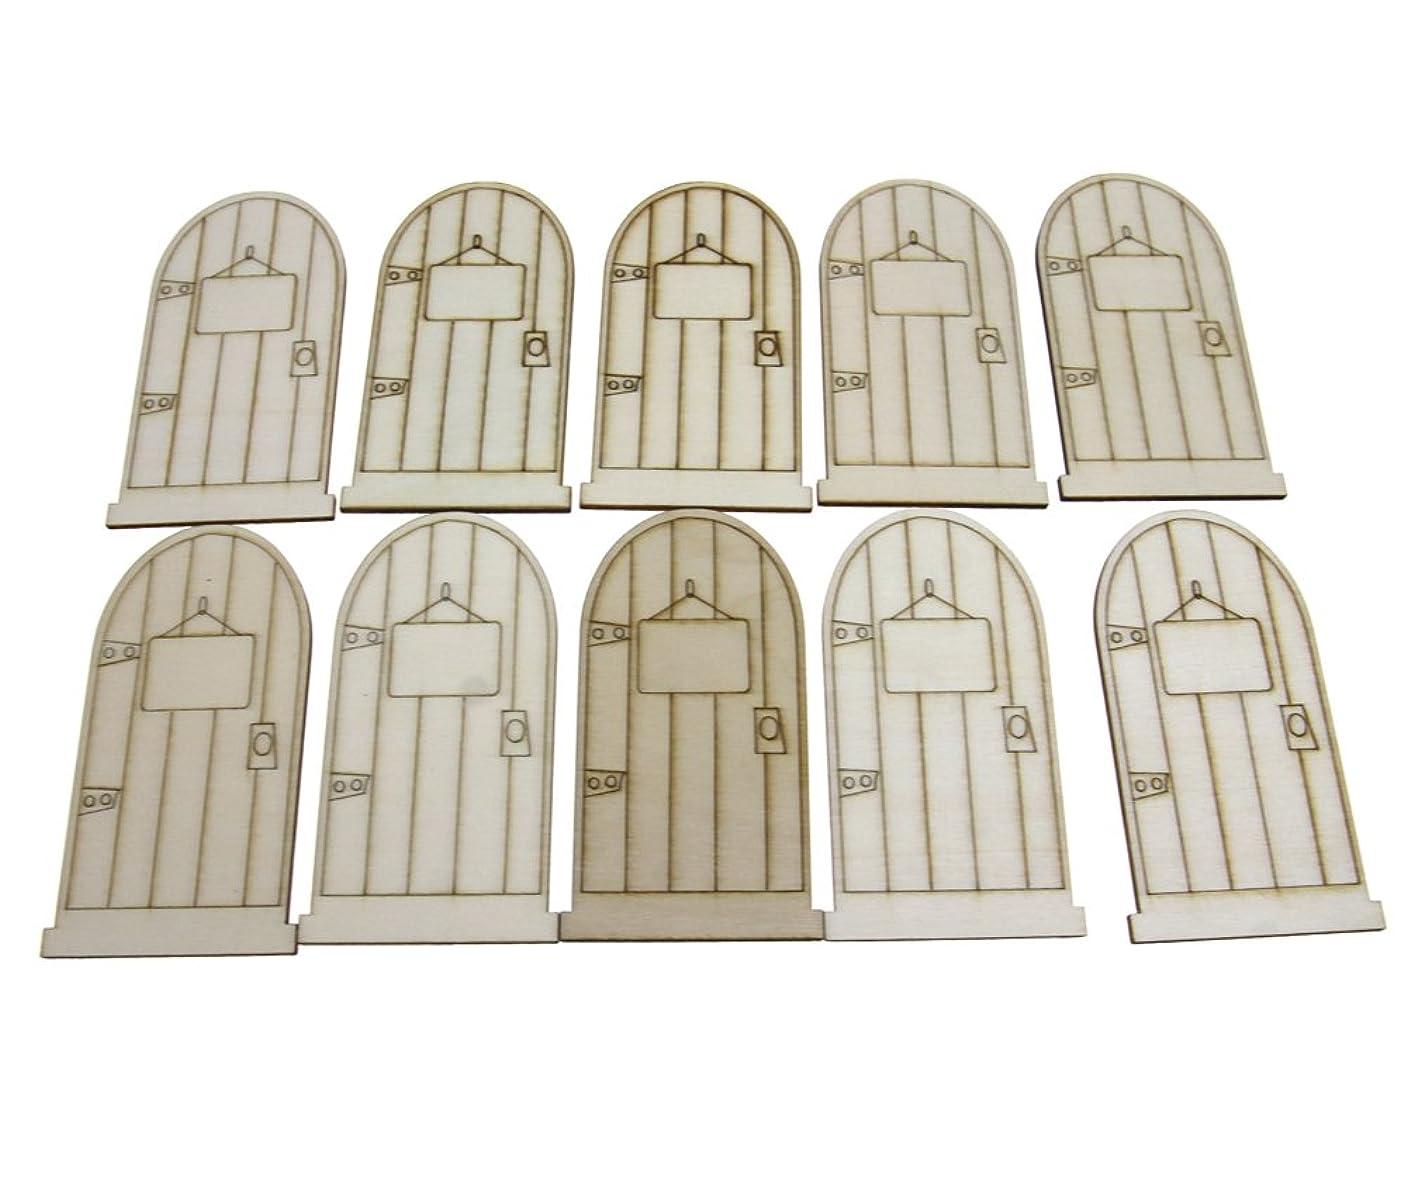 10pcs DIY Crafts Unpainted Elf Faires Wooden Door Embellishments Dollhouse